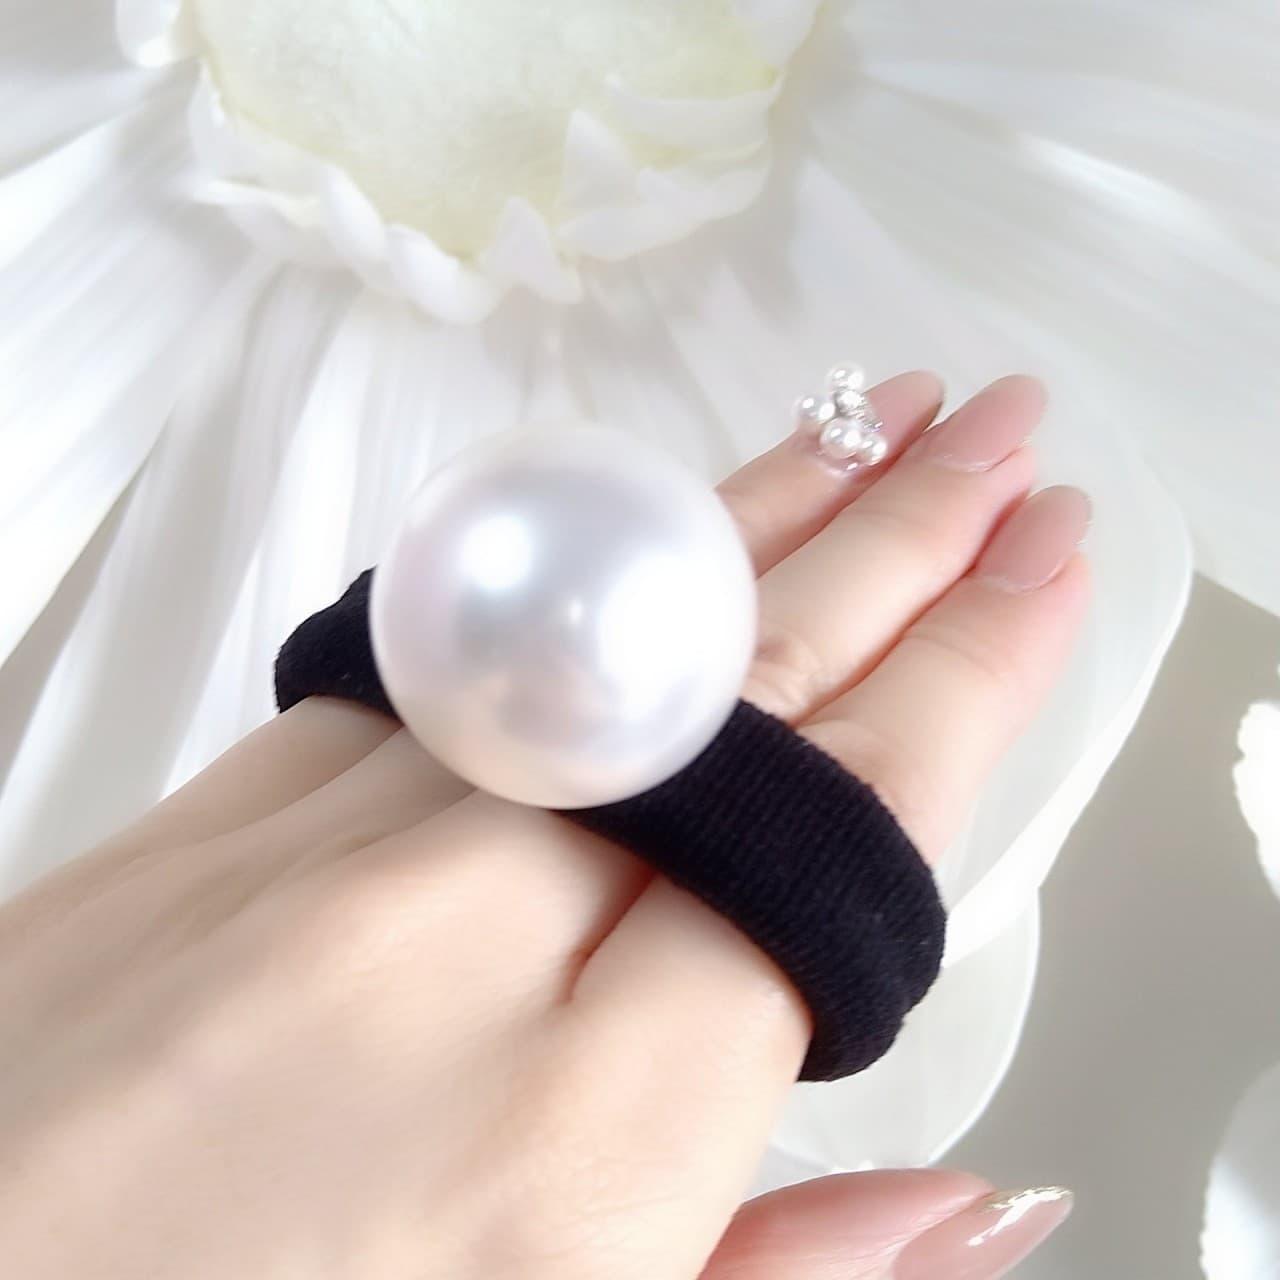 kikiオリジナルのエヴァダイヤを使用して作った手首につけたりヘアーアクセサリーにもなる『エヴァノット』の追加で購入できる30ミリの特大パール